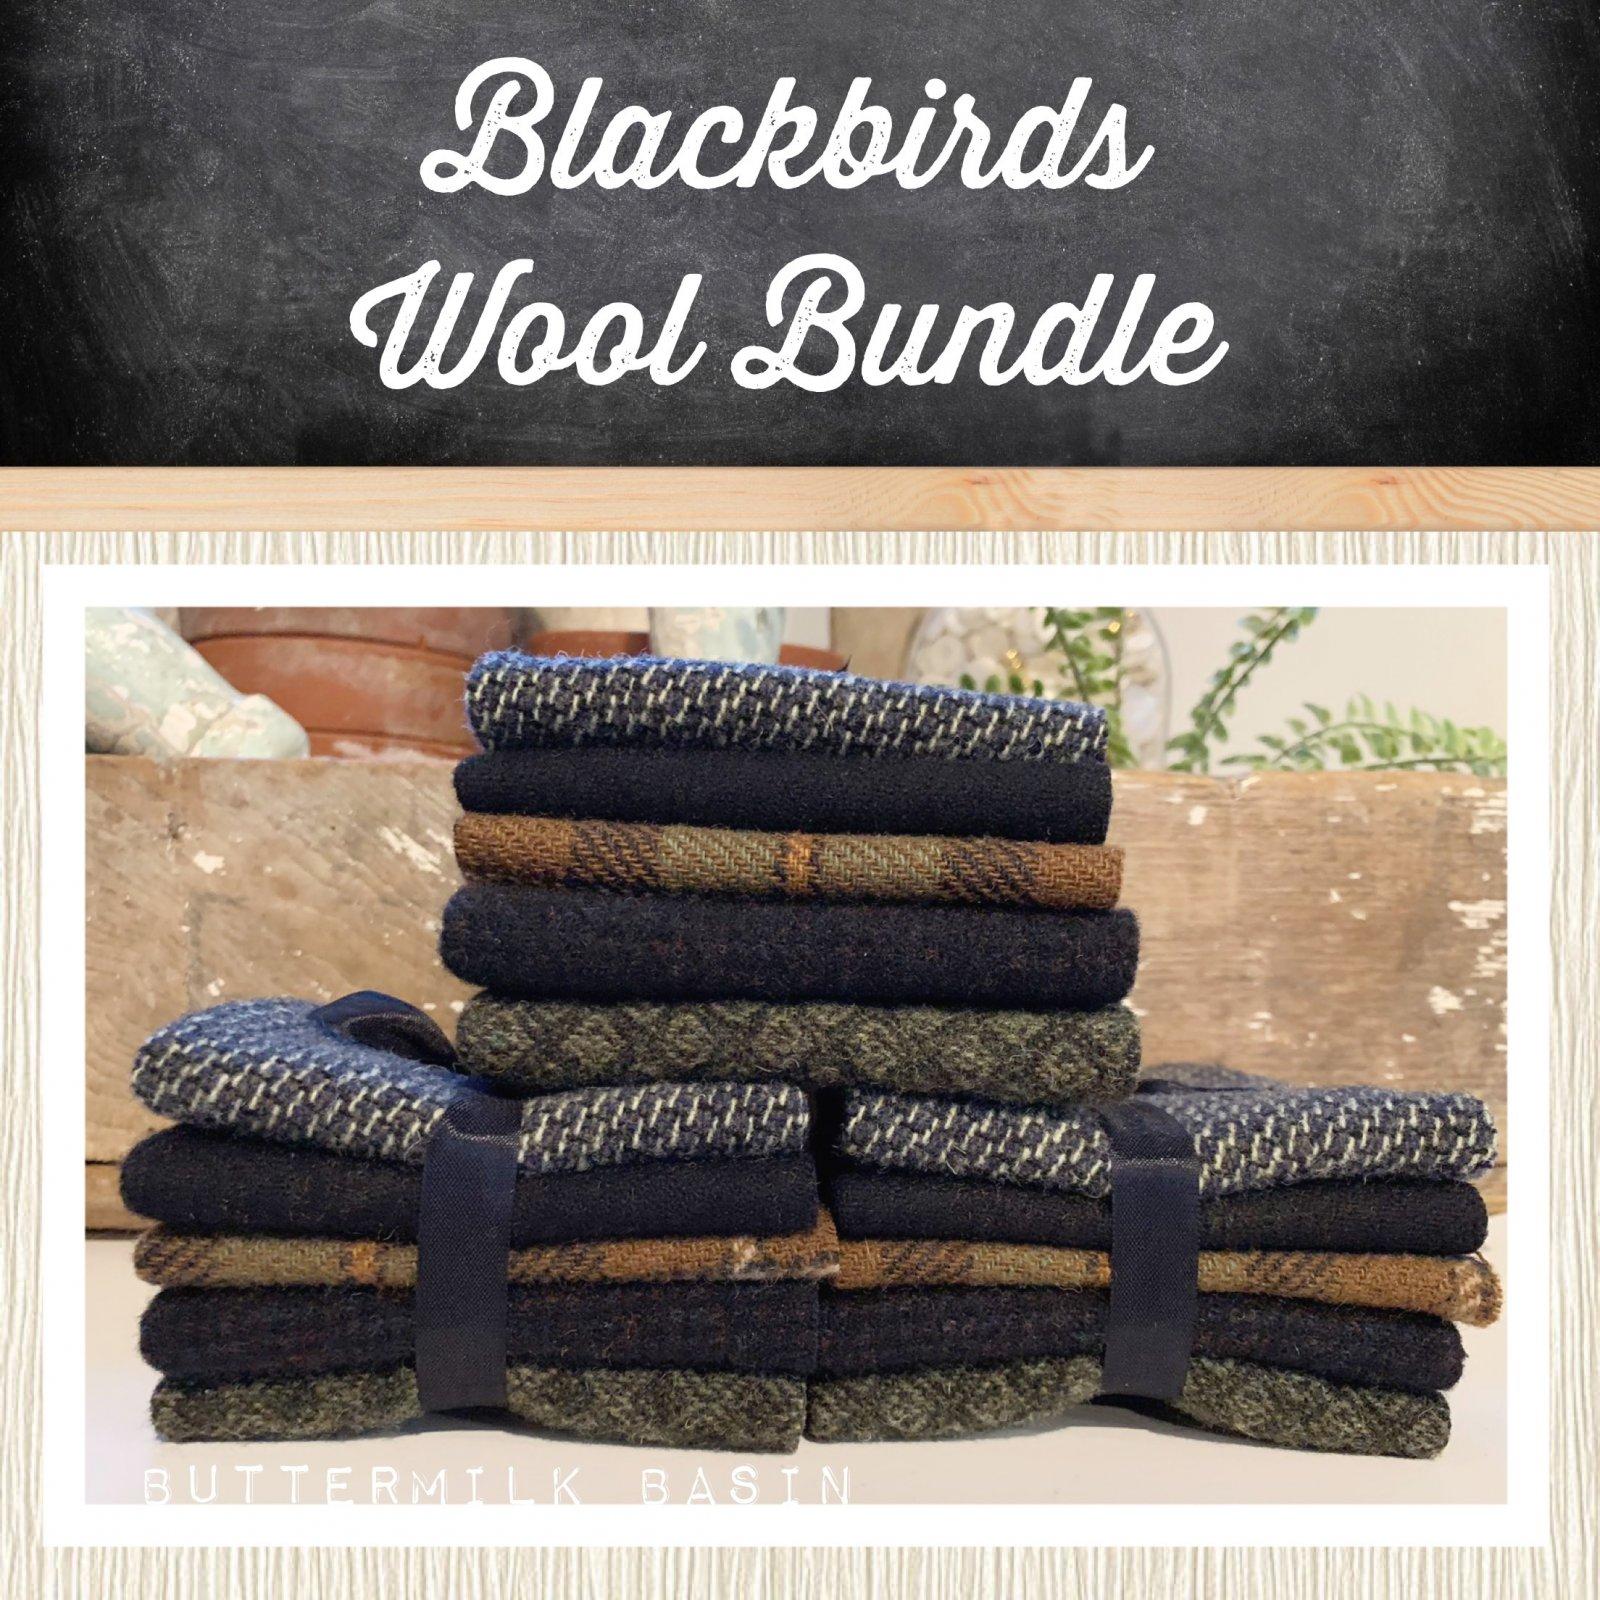 Blackbirds Wool Bundle